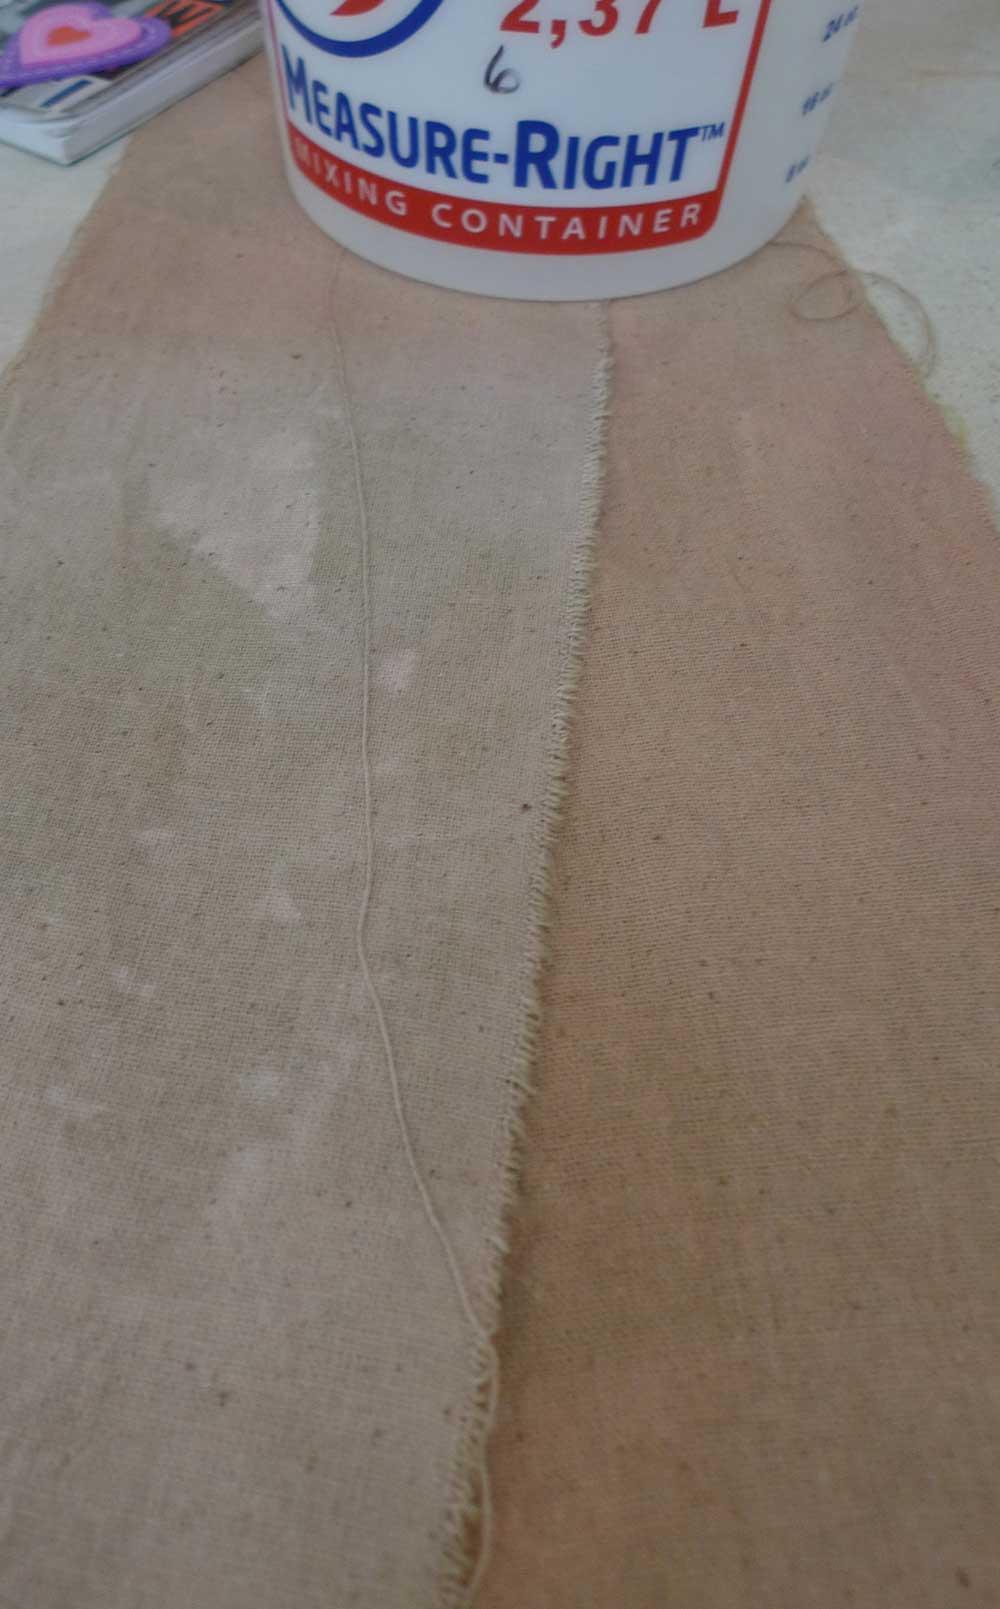 G&K 2215 Rust Orange & G&K 5193 Bronze: 1/2 cup Rust Orange dye stock, 1/3 cup Bronze dye stock, 2 cup soda stock, 2 cup water (1 hour soak) - various silk, cotton, linen